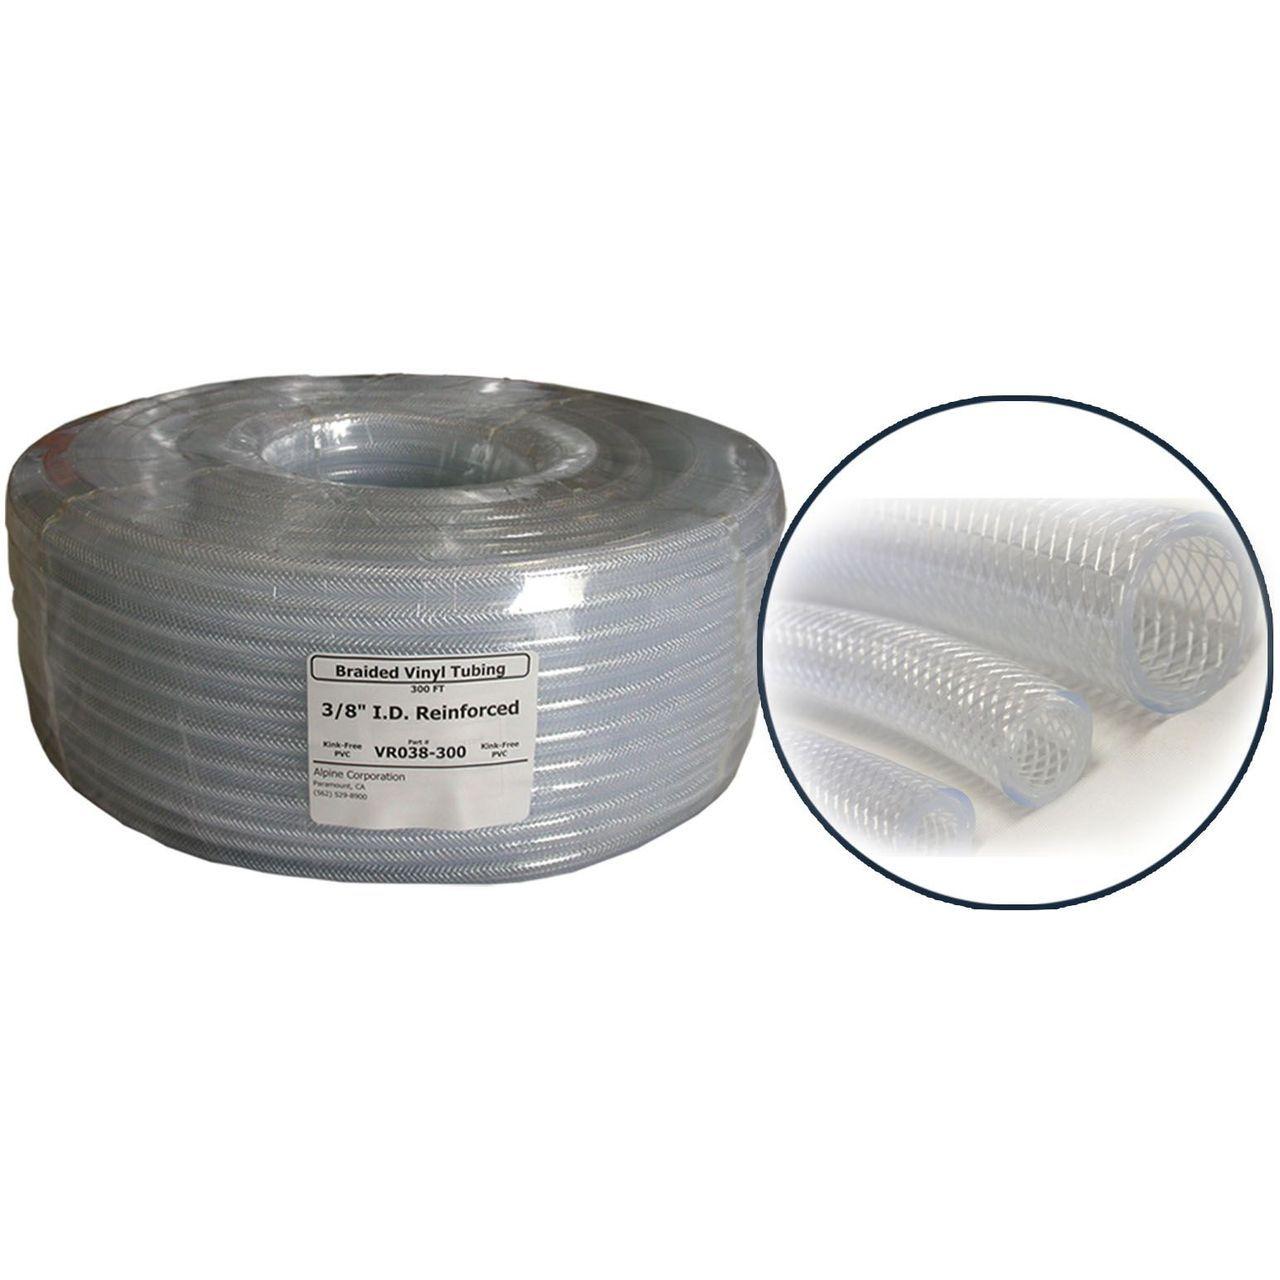 Alpine VR058 PVC Clear Braided Tubing - 5/8'' ID x 0.891''OD x 100' Coil